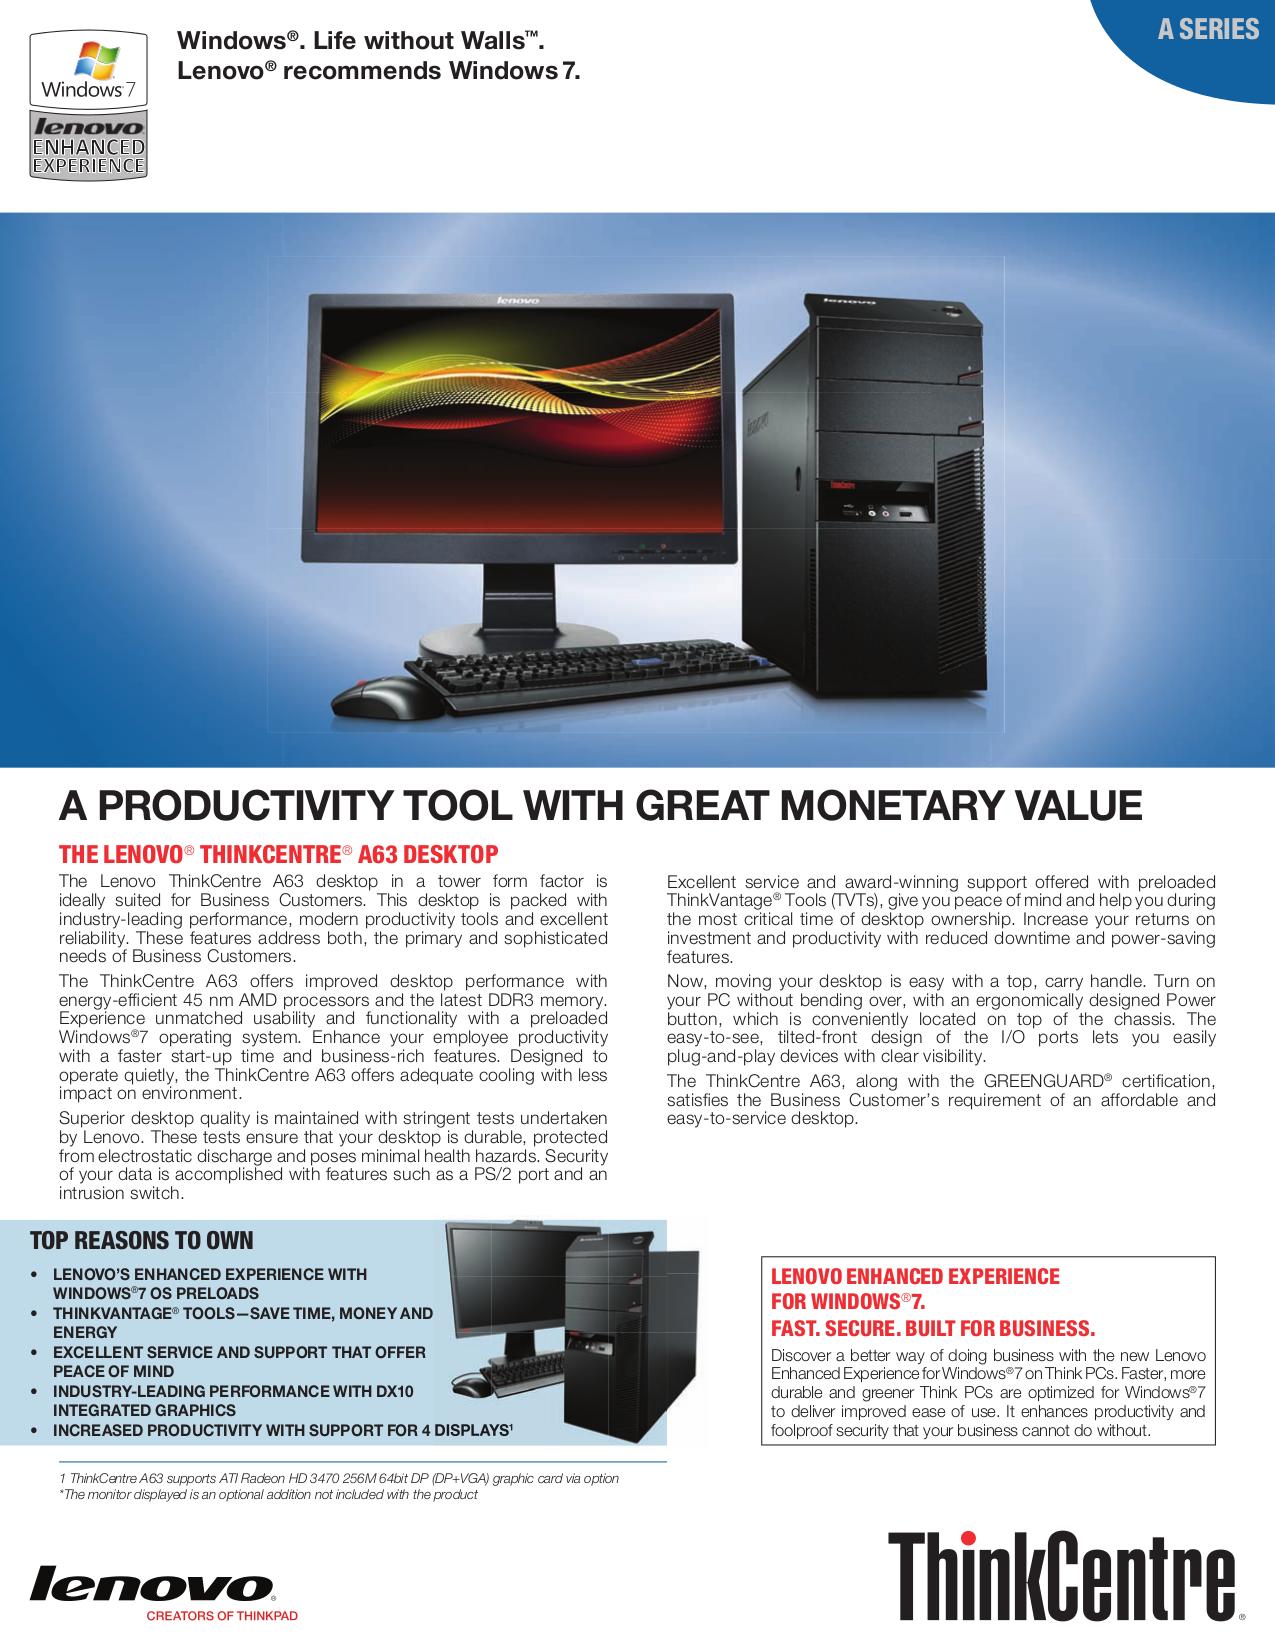 pdf for Lenovo Desktop ThinkCentre A63 5393 manual